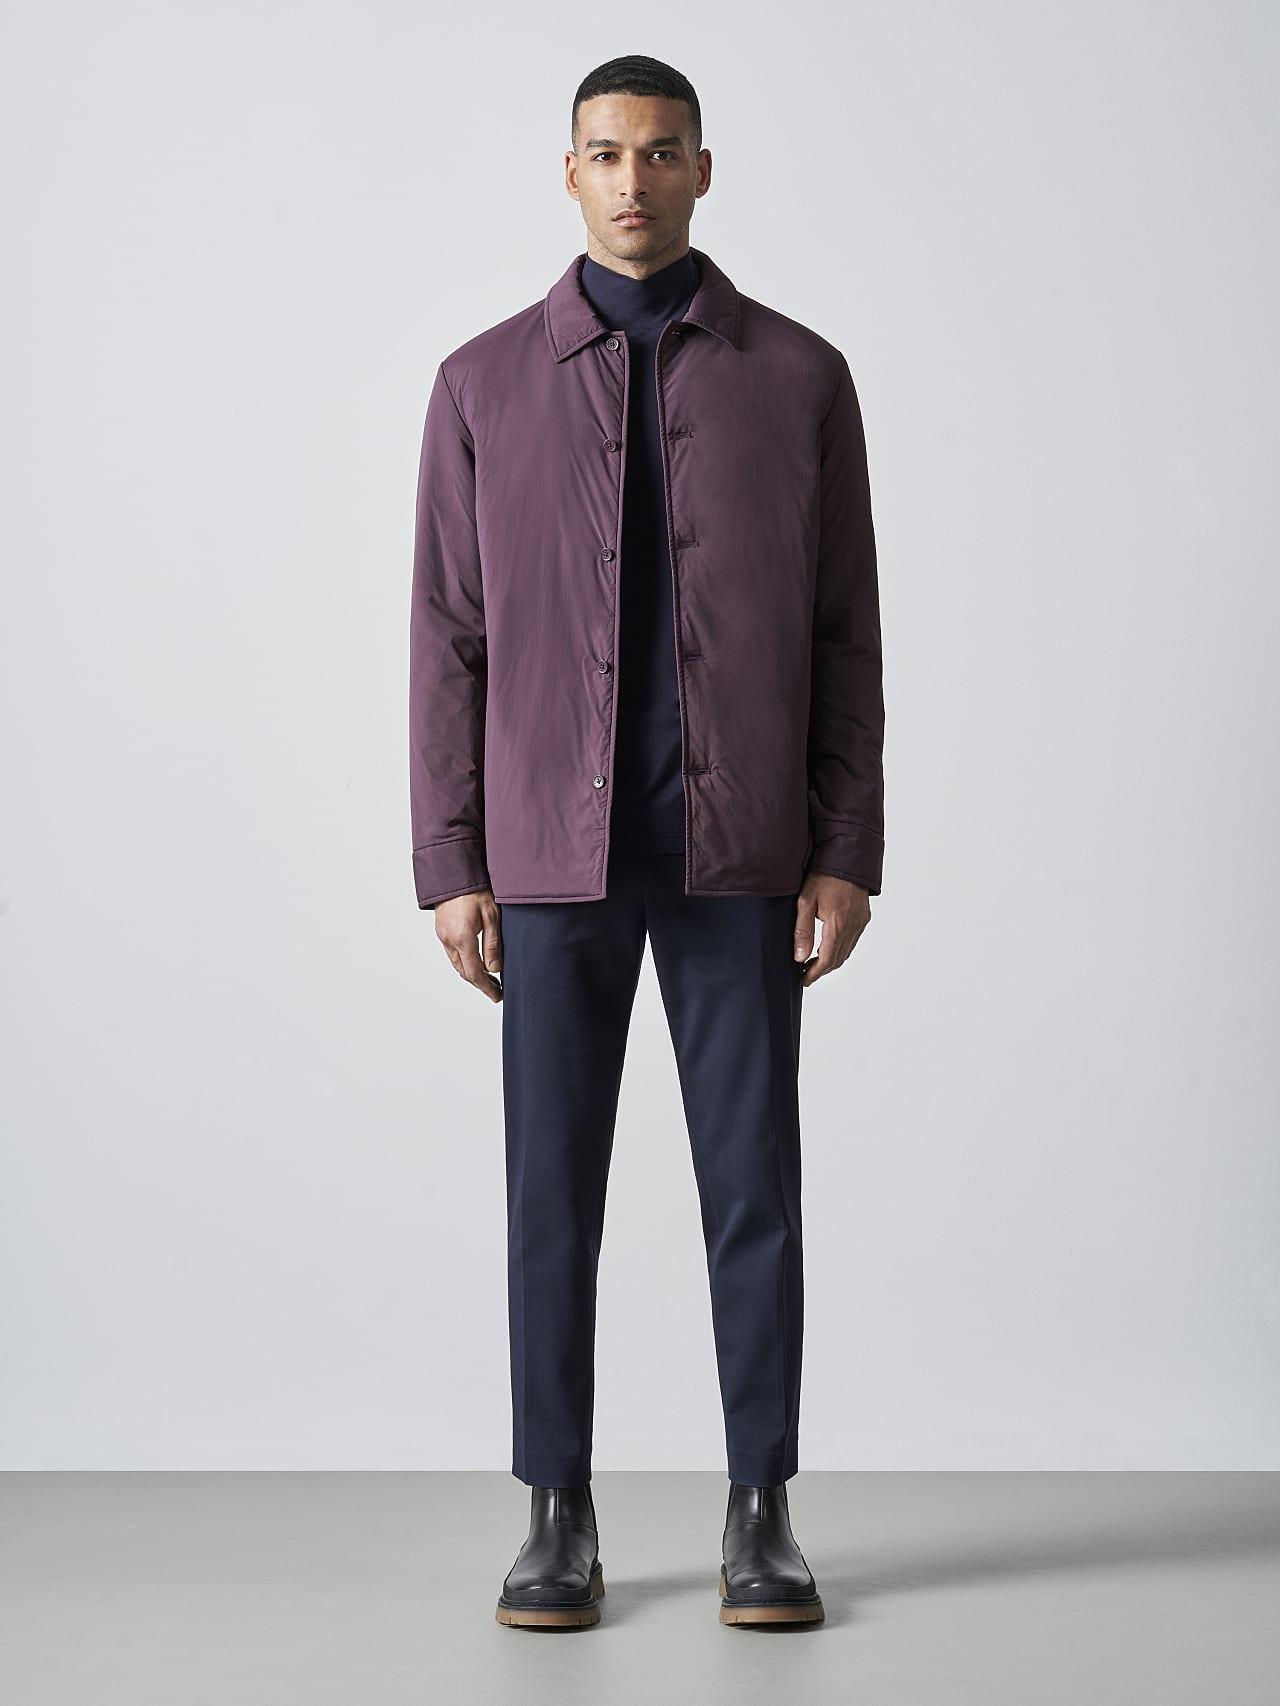 OVASU V1.Y5.02 PrimaLoft® Overshirt Jacket Burgundy Front Alpha Tauri